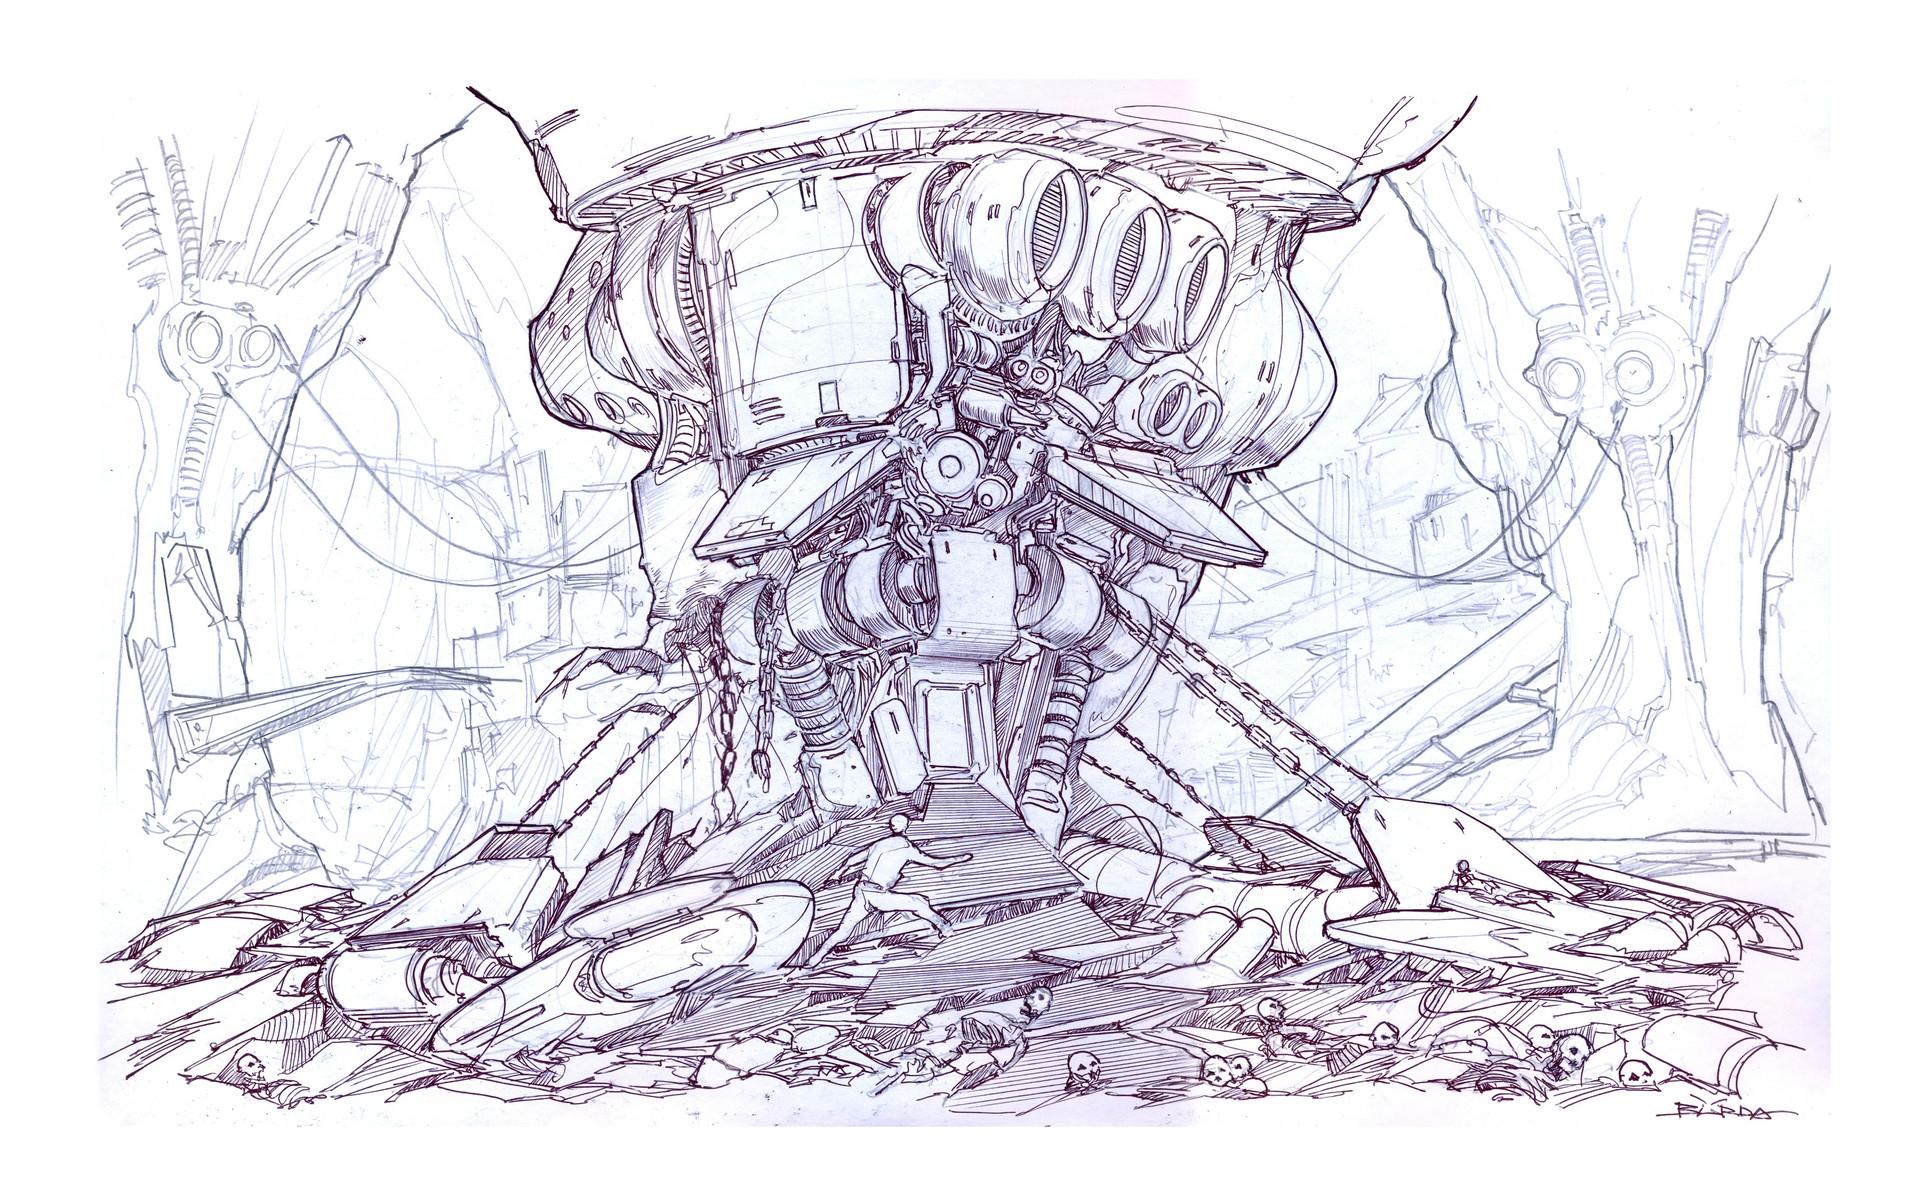 Alejandro burdisio boceto telm capsula y mnaquinaria